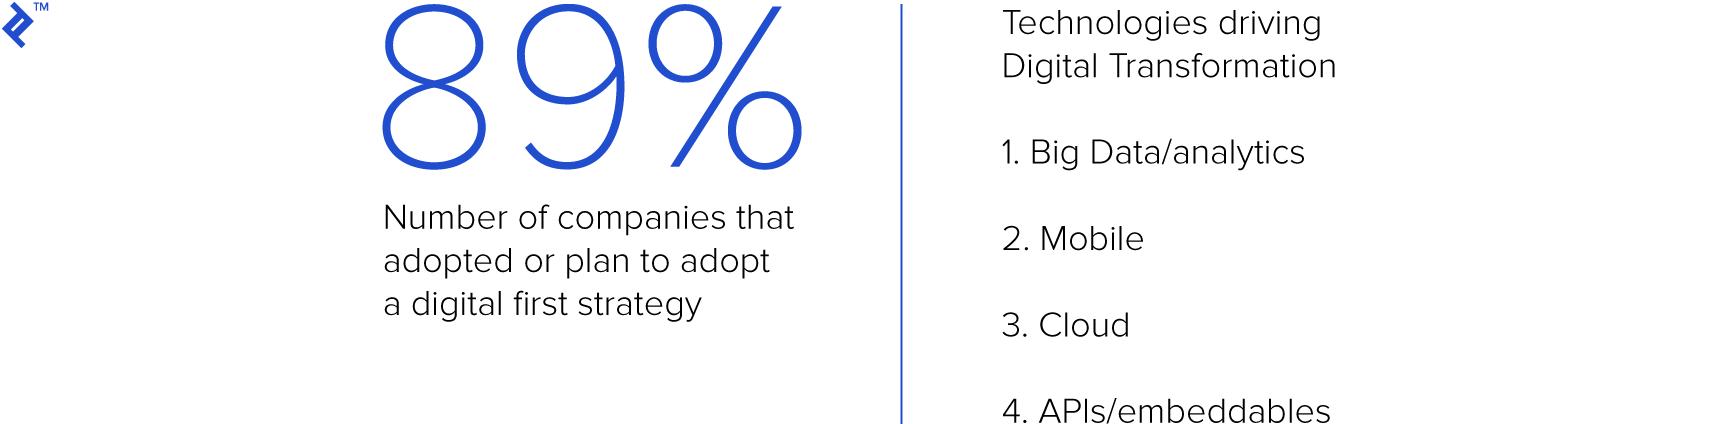 Technologies driving digital transformation